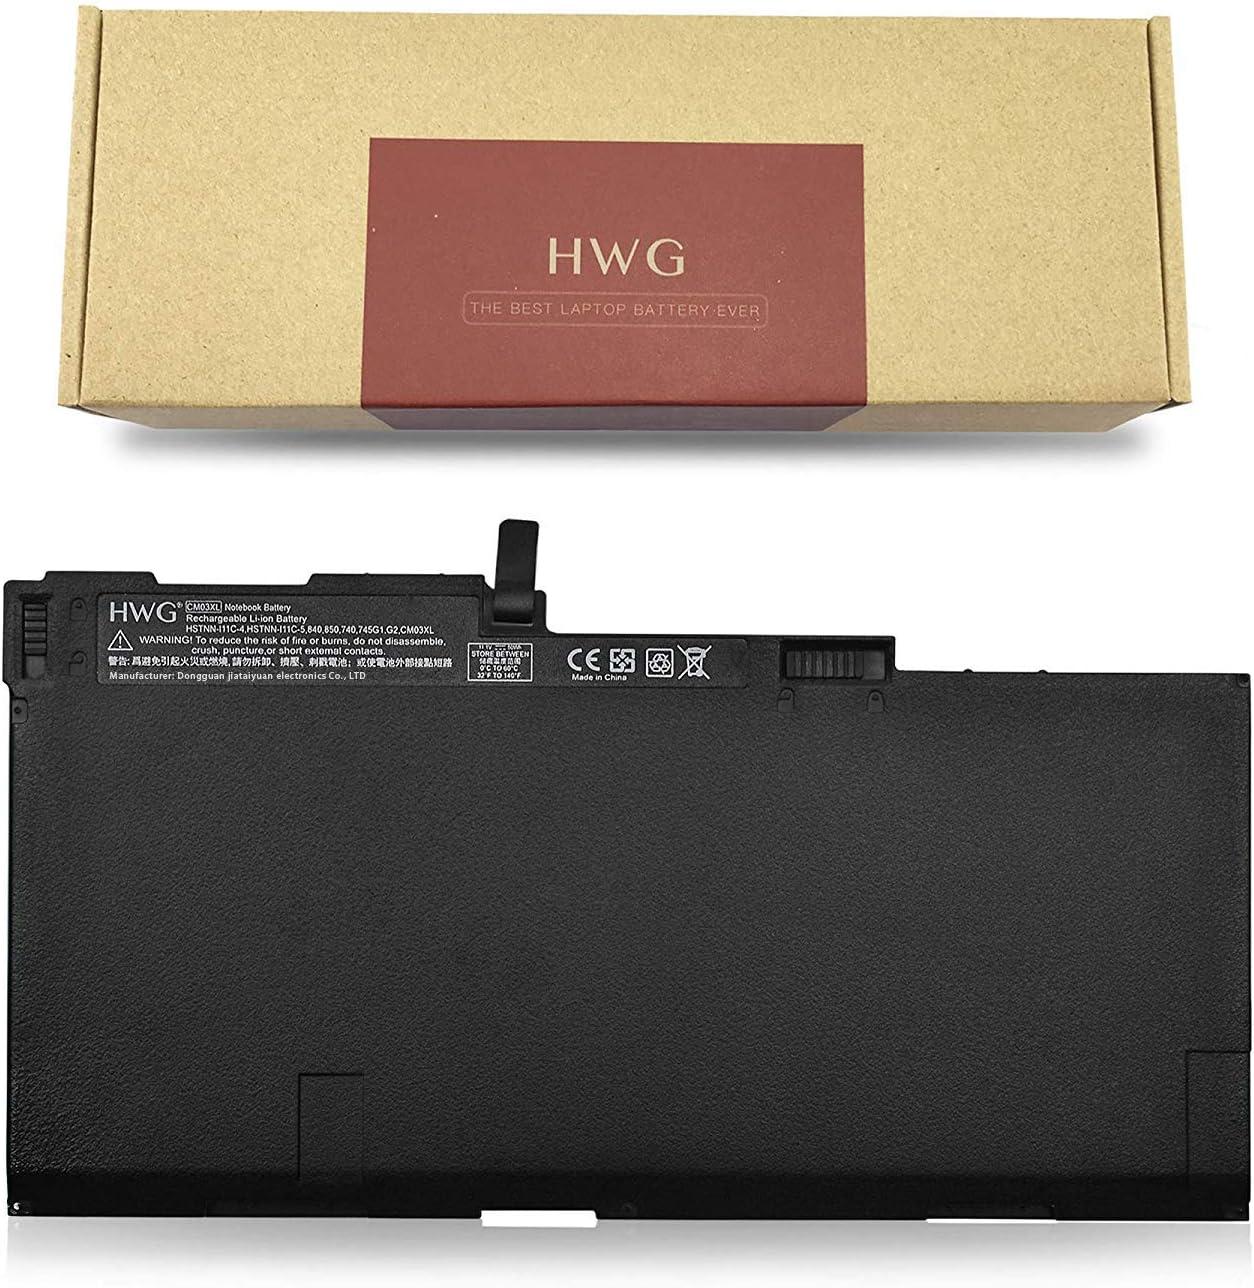 HWG CM03XL Battery Compatible HP EliteBook 740 745 750 840 845 850 G1 G2 Series 717376-001 CO06 CO06XL HSTNN-IB4R HSTNN-DB4Q HSTNN-LB4R HP ZBook 14 [11.1V, 50Wh]